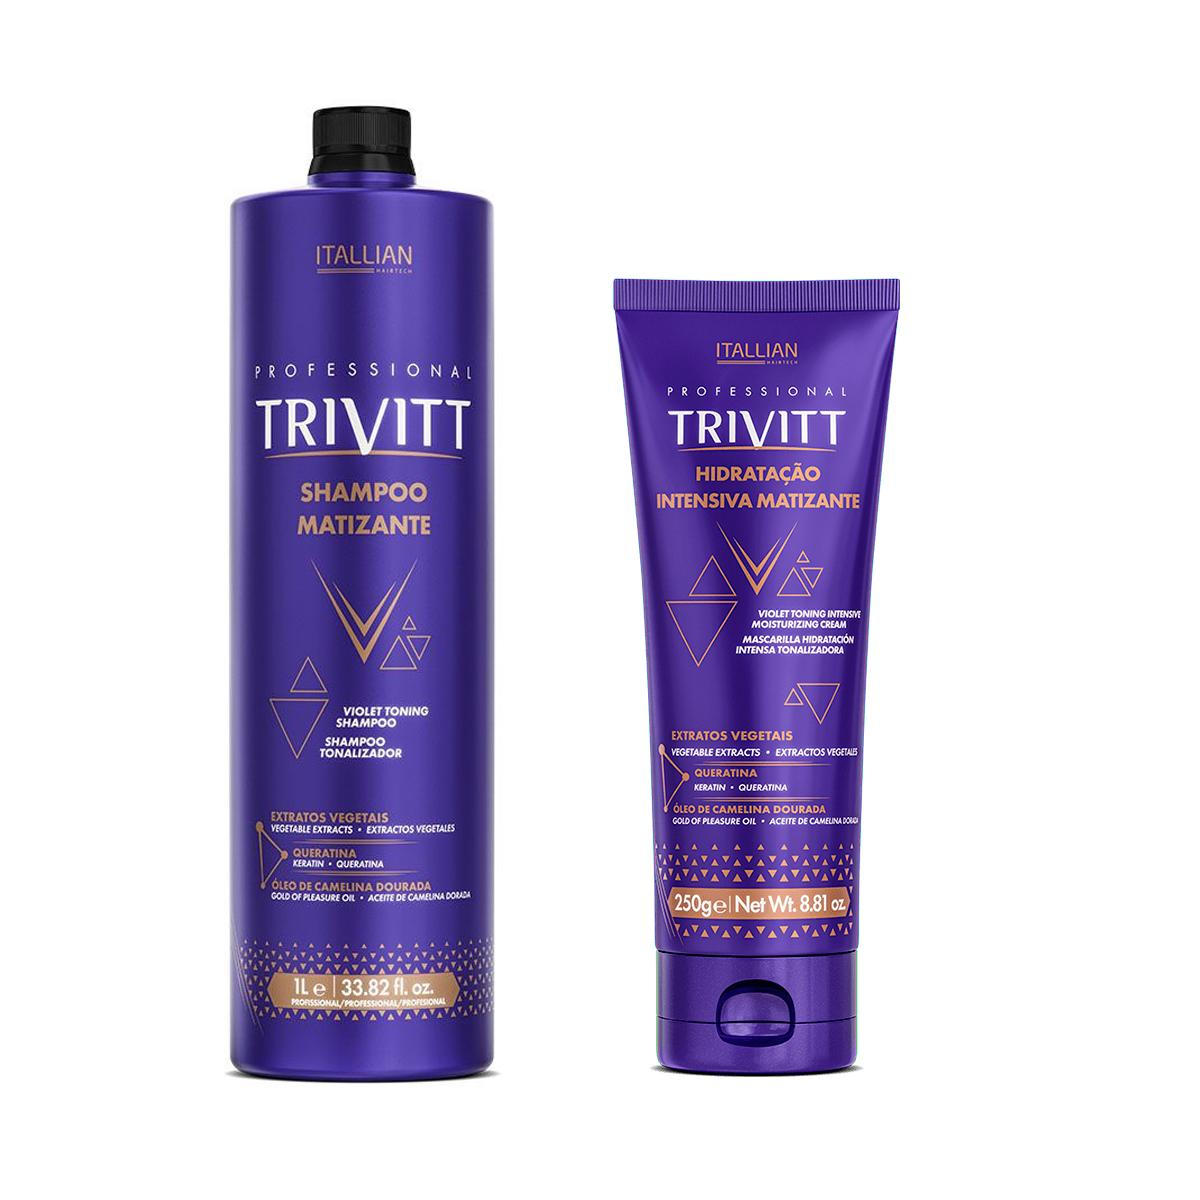 Kit Trivitt Matizante Shampoo 1L e Máscara Matizante 250gr